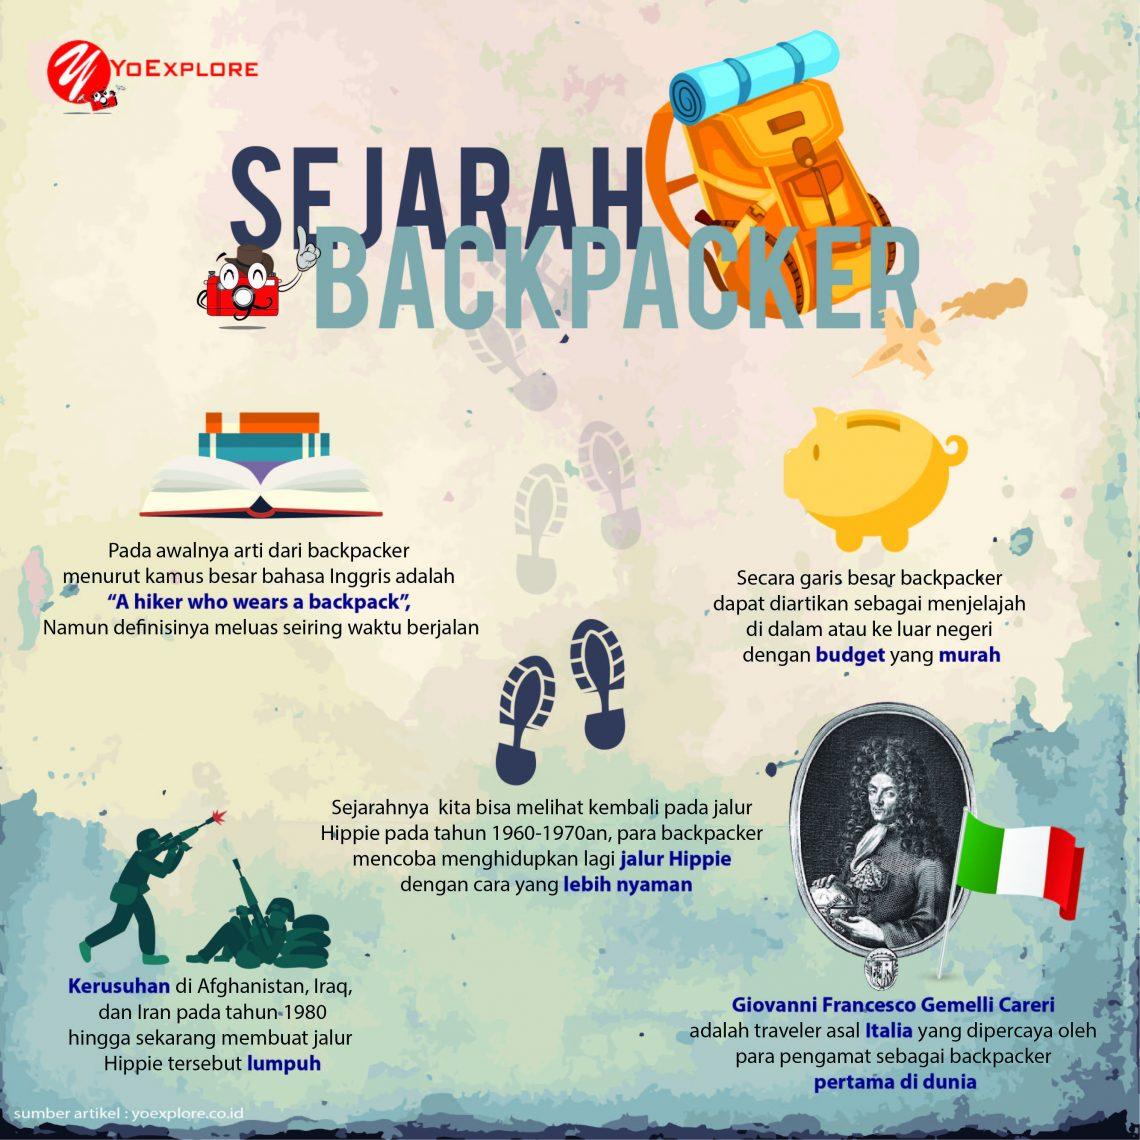 sejarah backpacker